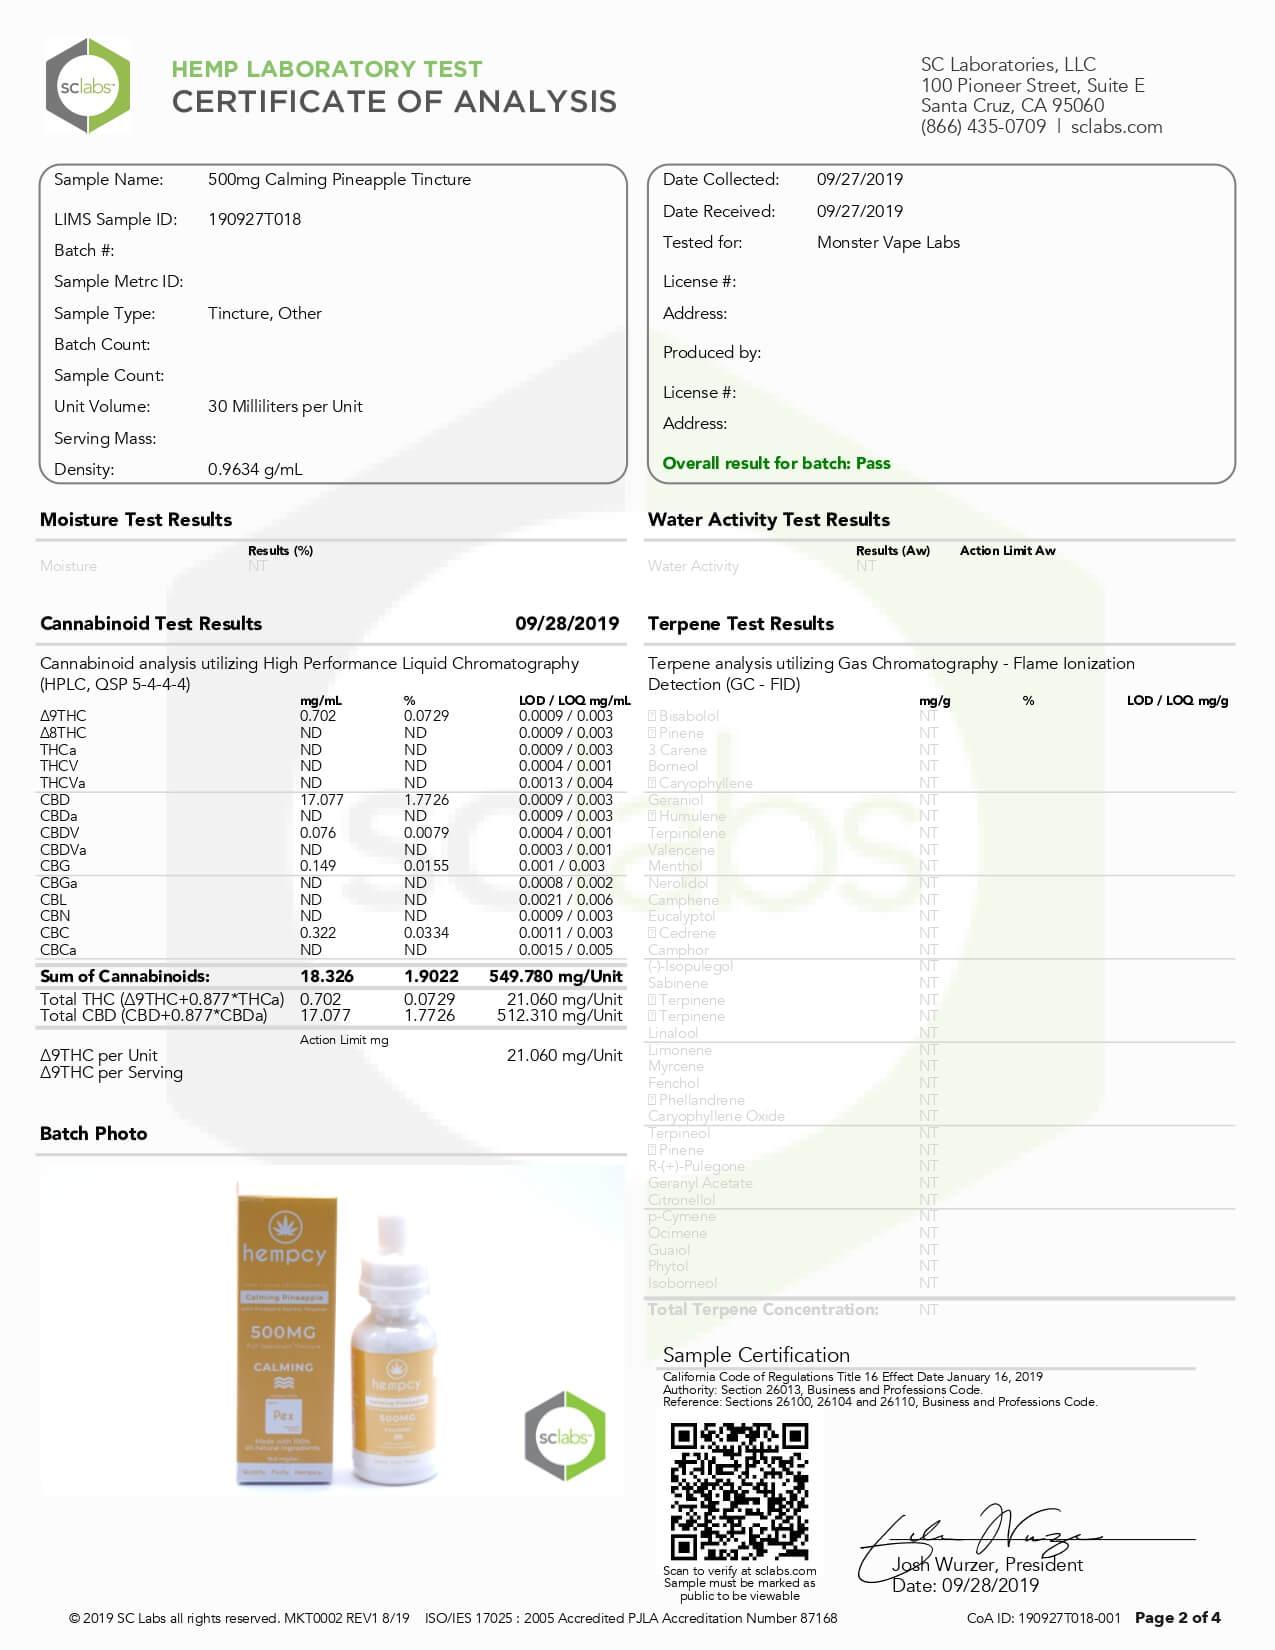 Hempcy CBD Tincture Calming Pineapple 500mg Lab Report